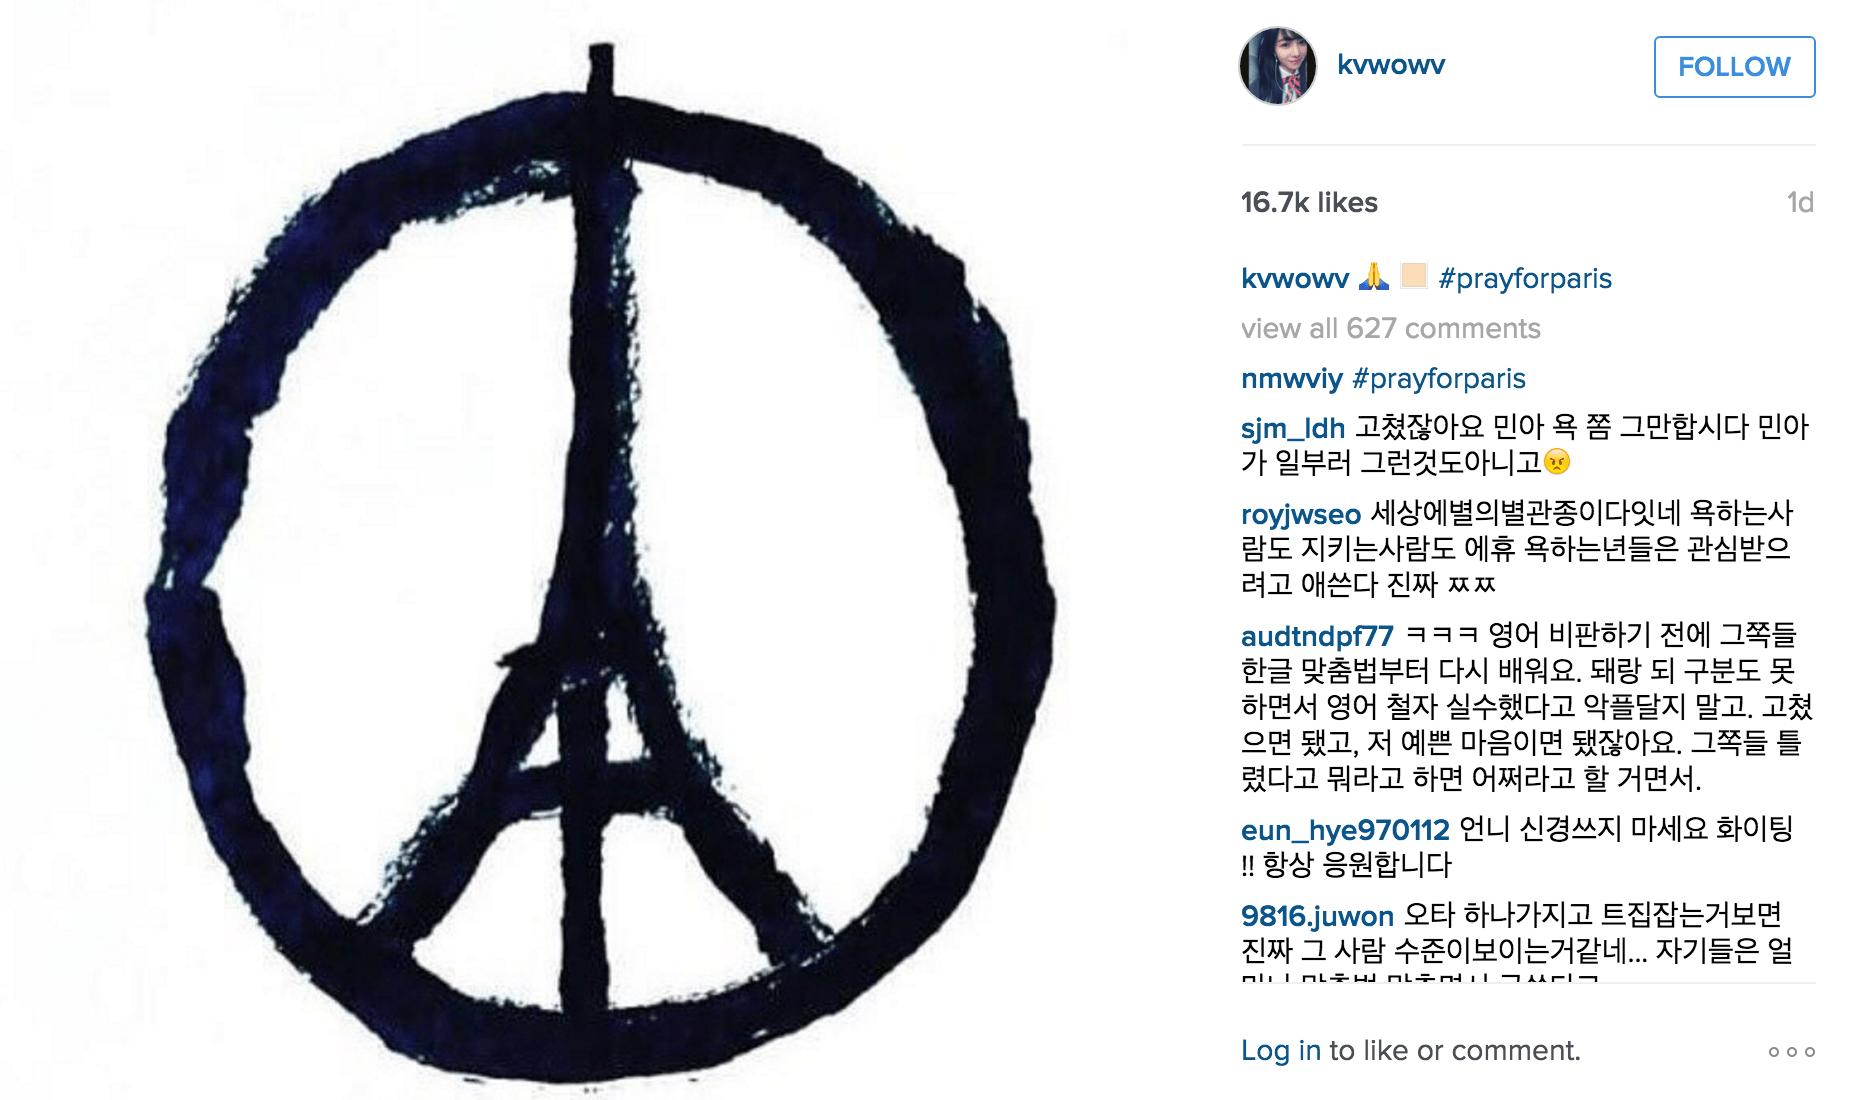 Image: Minah's Instagram